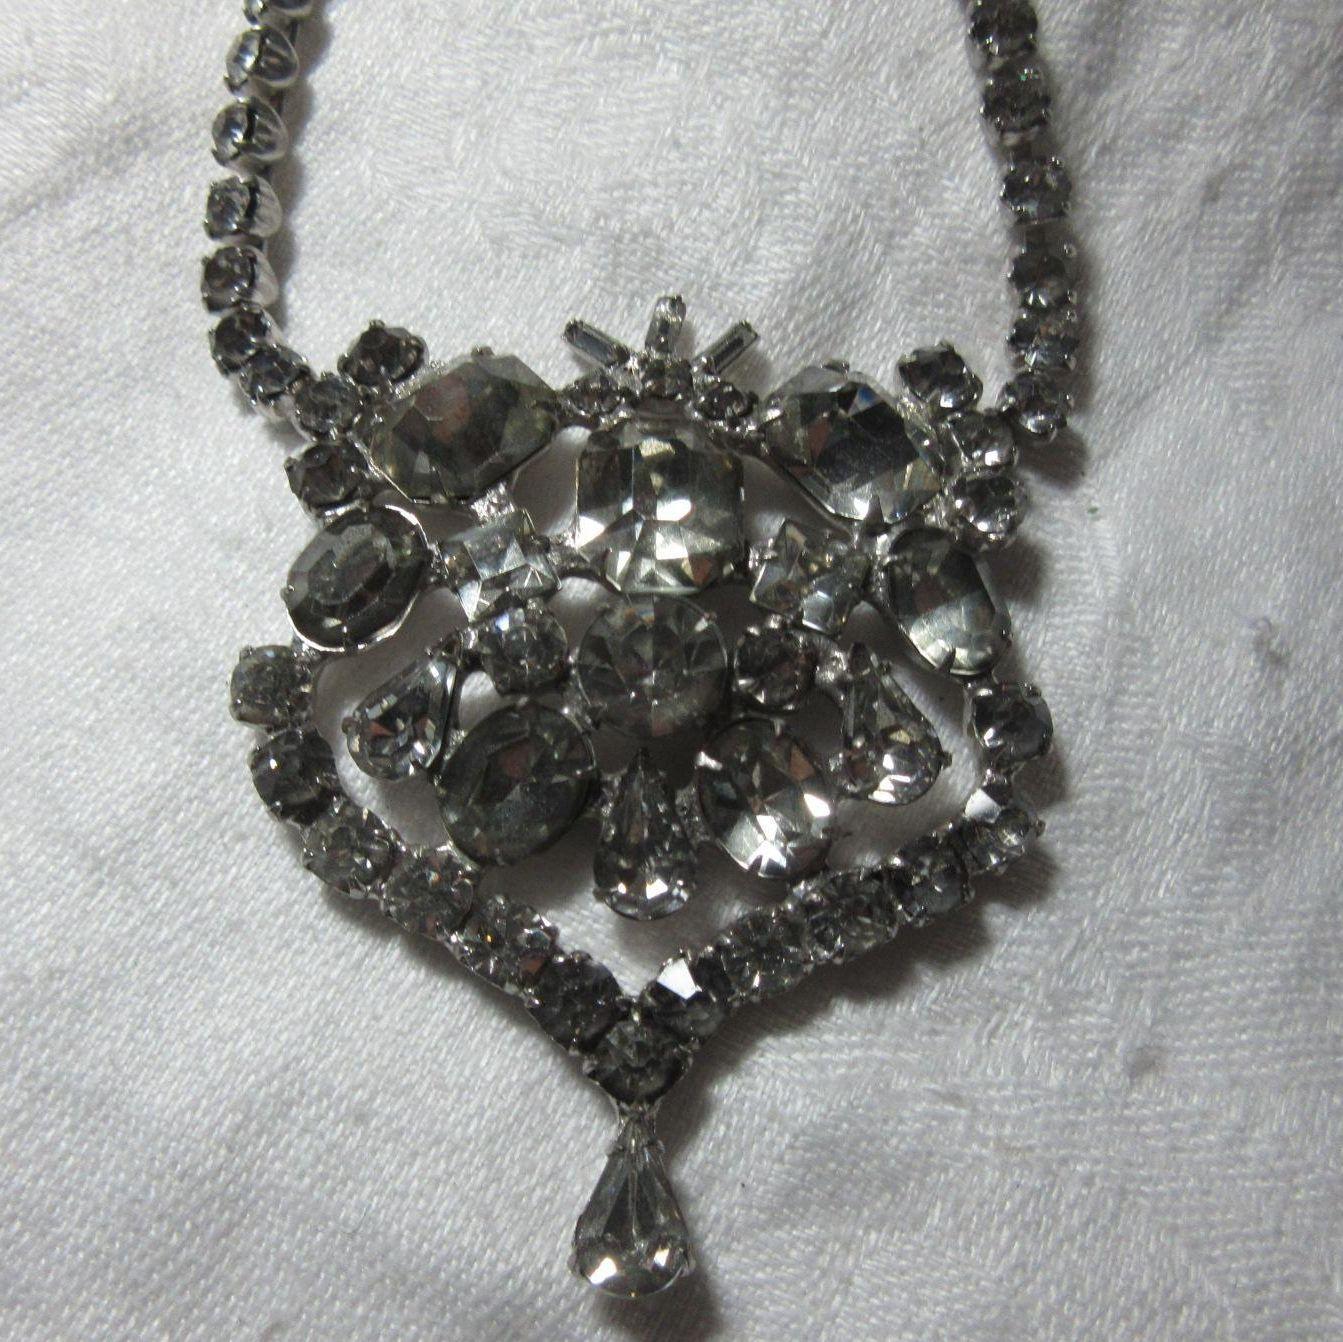 Old Rhinestone Elegant Necklace Fine Vintage Jewelry